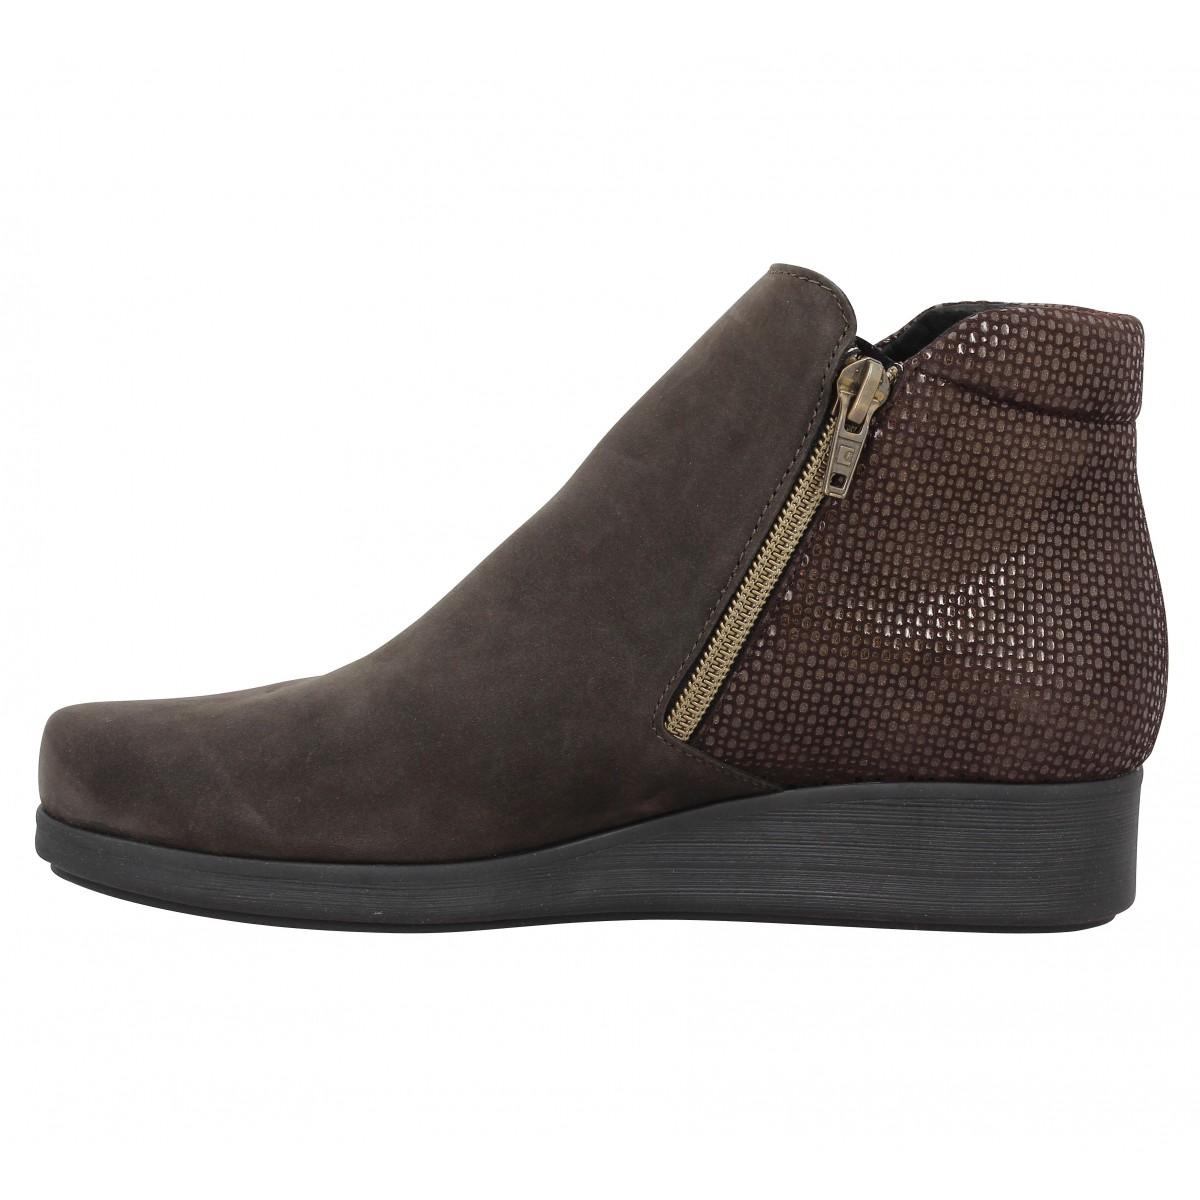 Fanny ebene femme chaussures femme Hirica nubuck bercy n1wpqXTn6